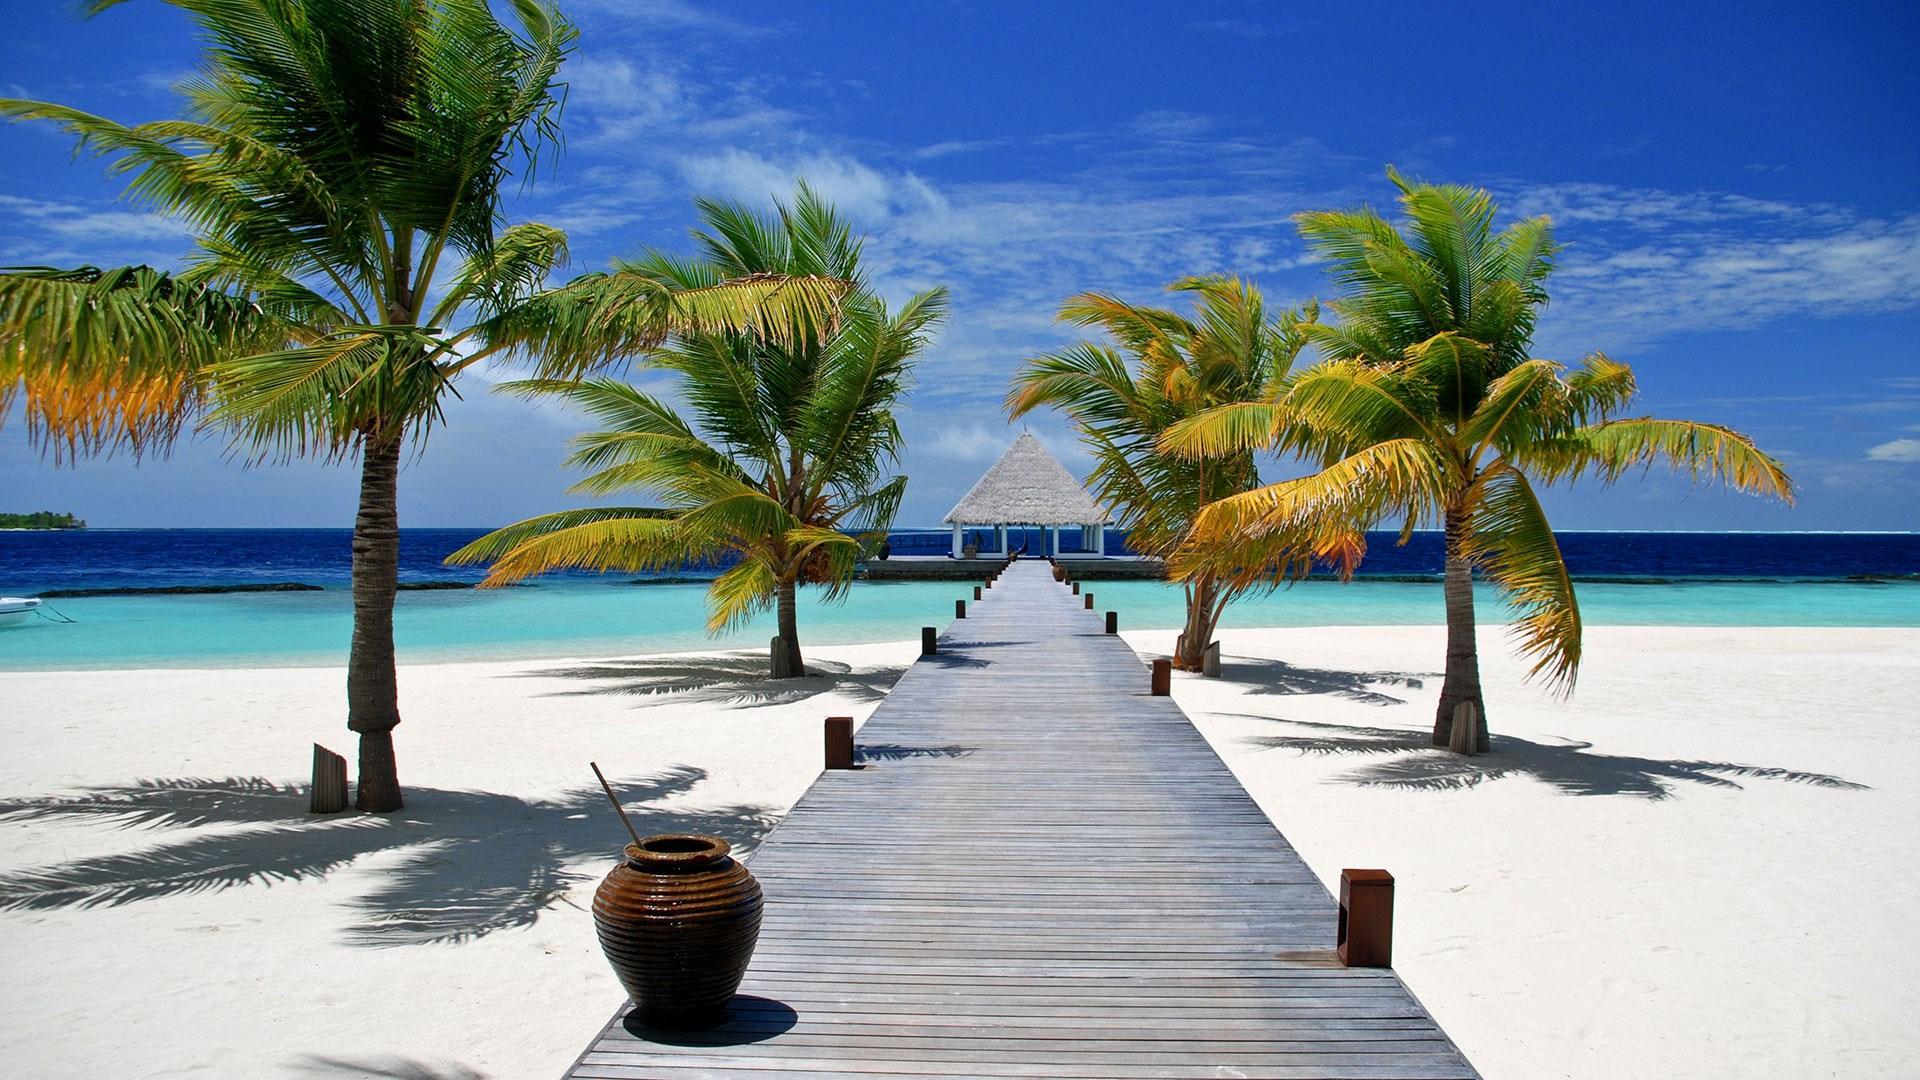 Karibik Wallpaper - Attalea Speciosa , HD Wallpaper & Backgrounds